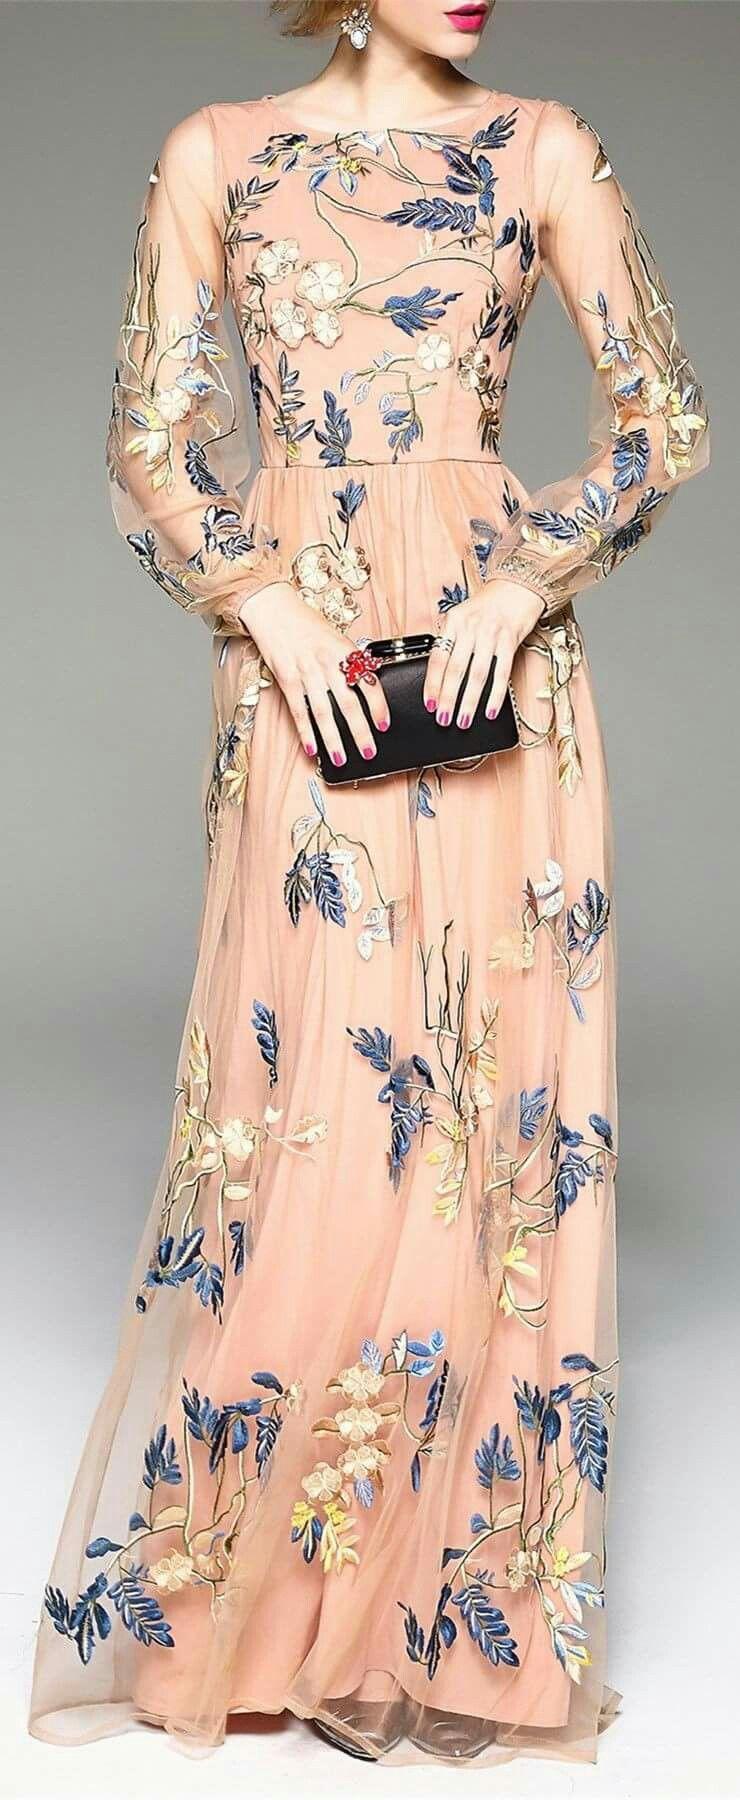 Pin by oralia reynoso on vestir con elegancia pinterest clothes